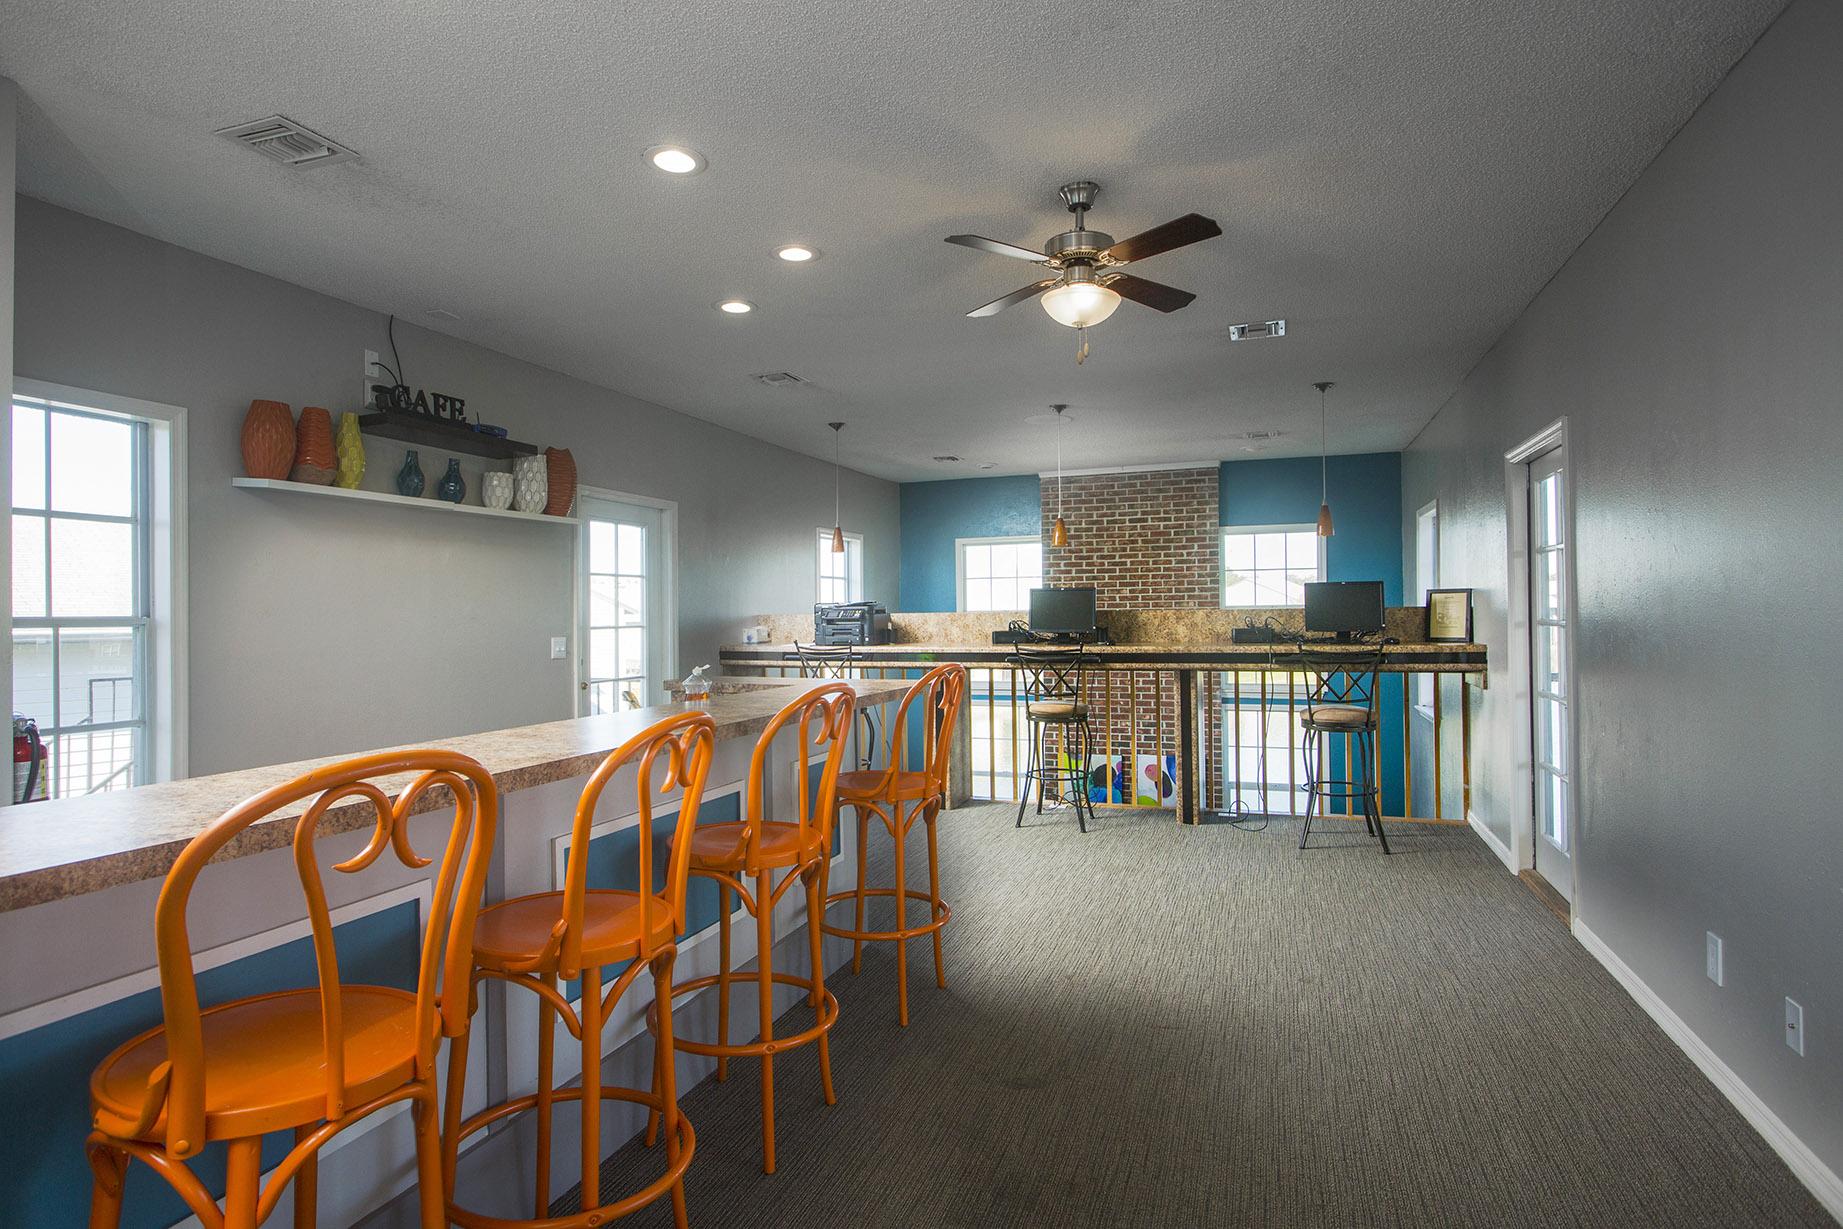 CharlestonLandings-Rental-Apartment-Brandon-Florida-Media-Center3.jpg